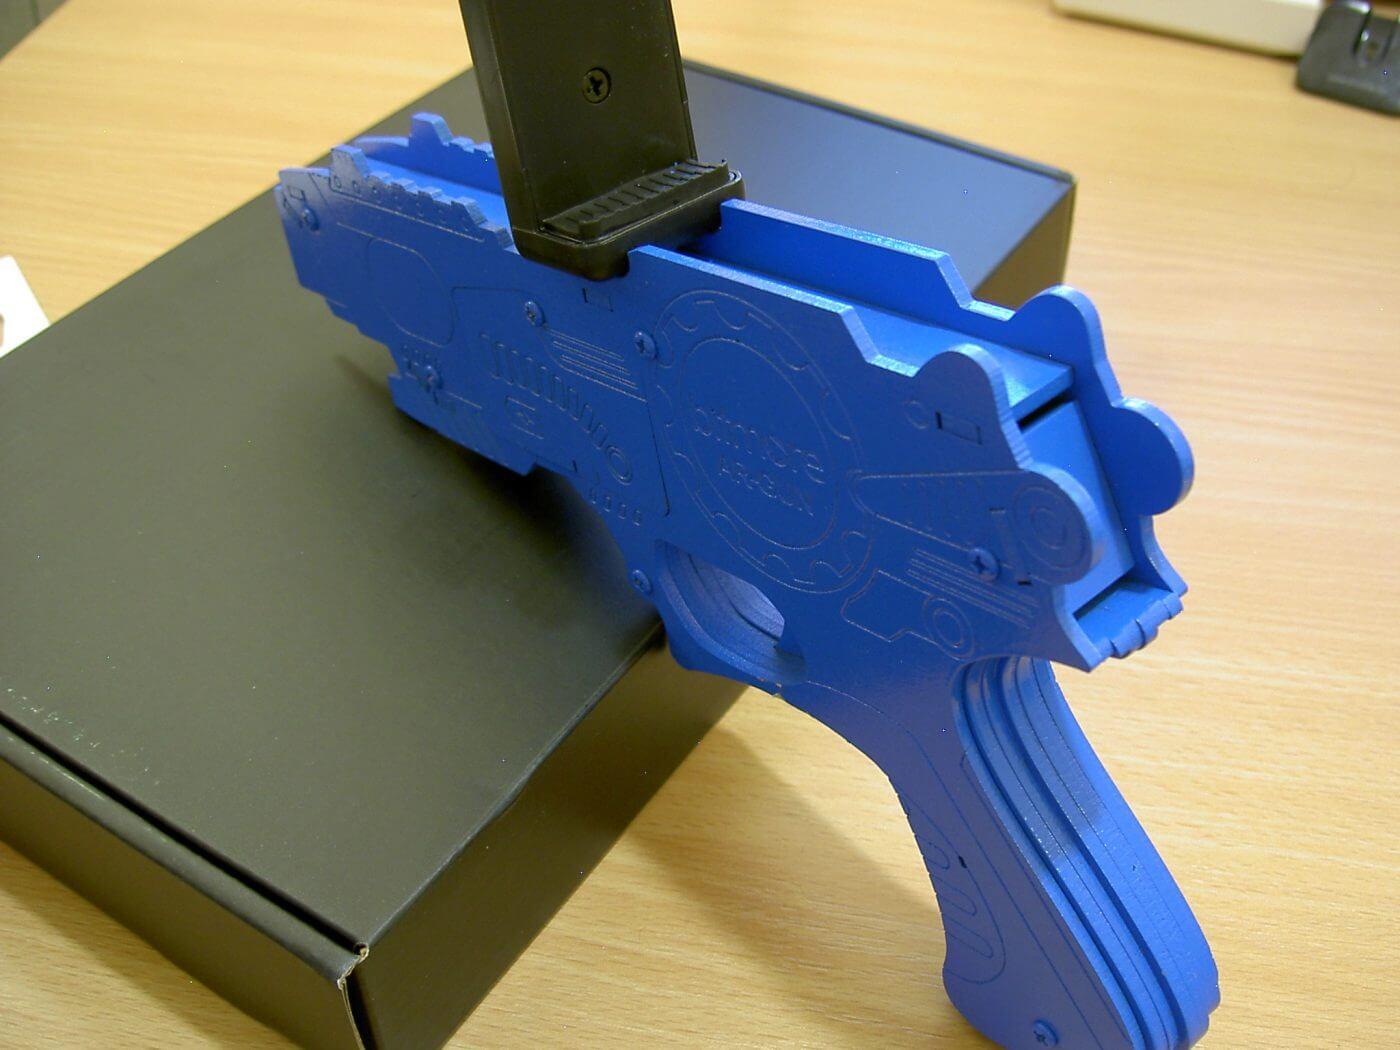 worlds ar blaster pro edition pairing